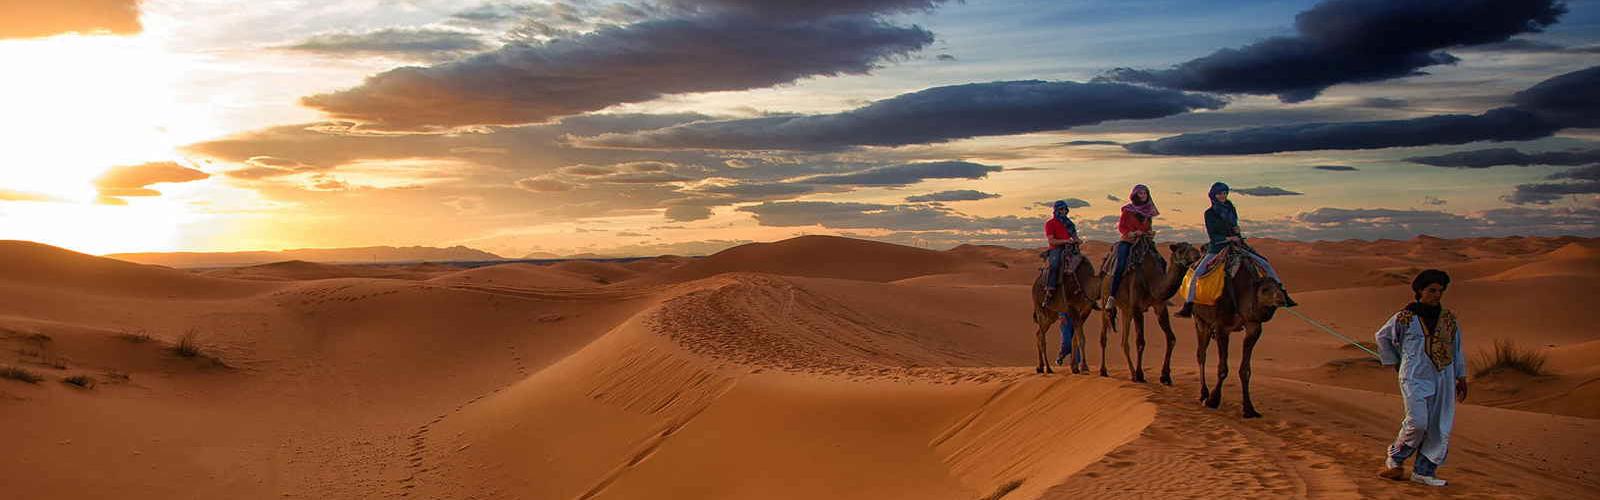 Tours Marrocos deserto saara